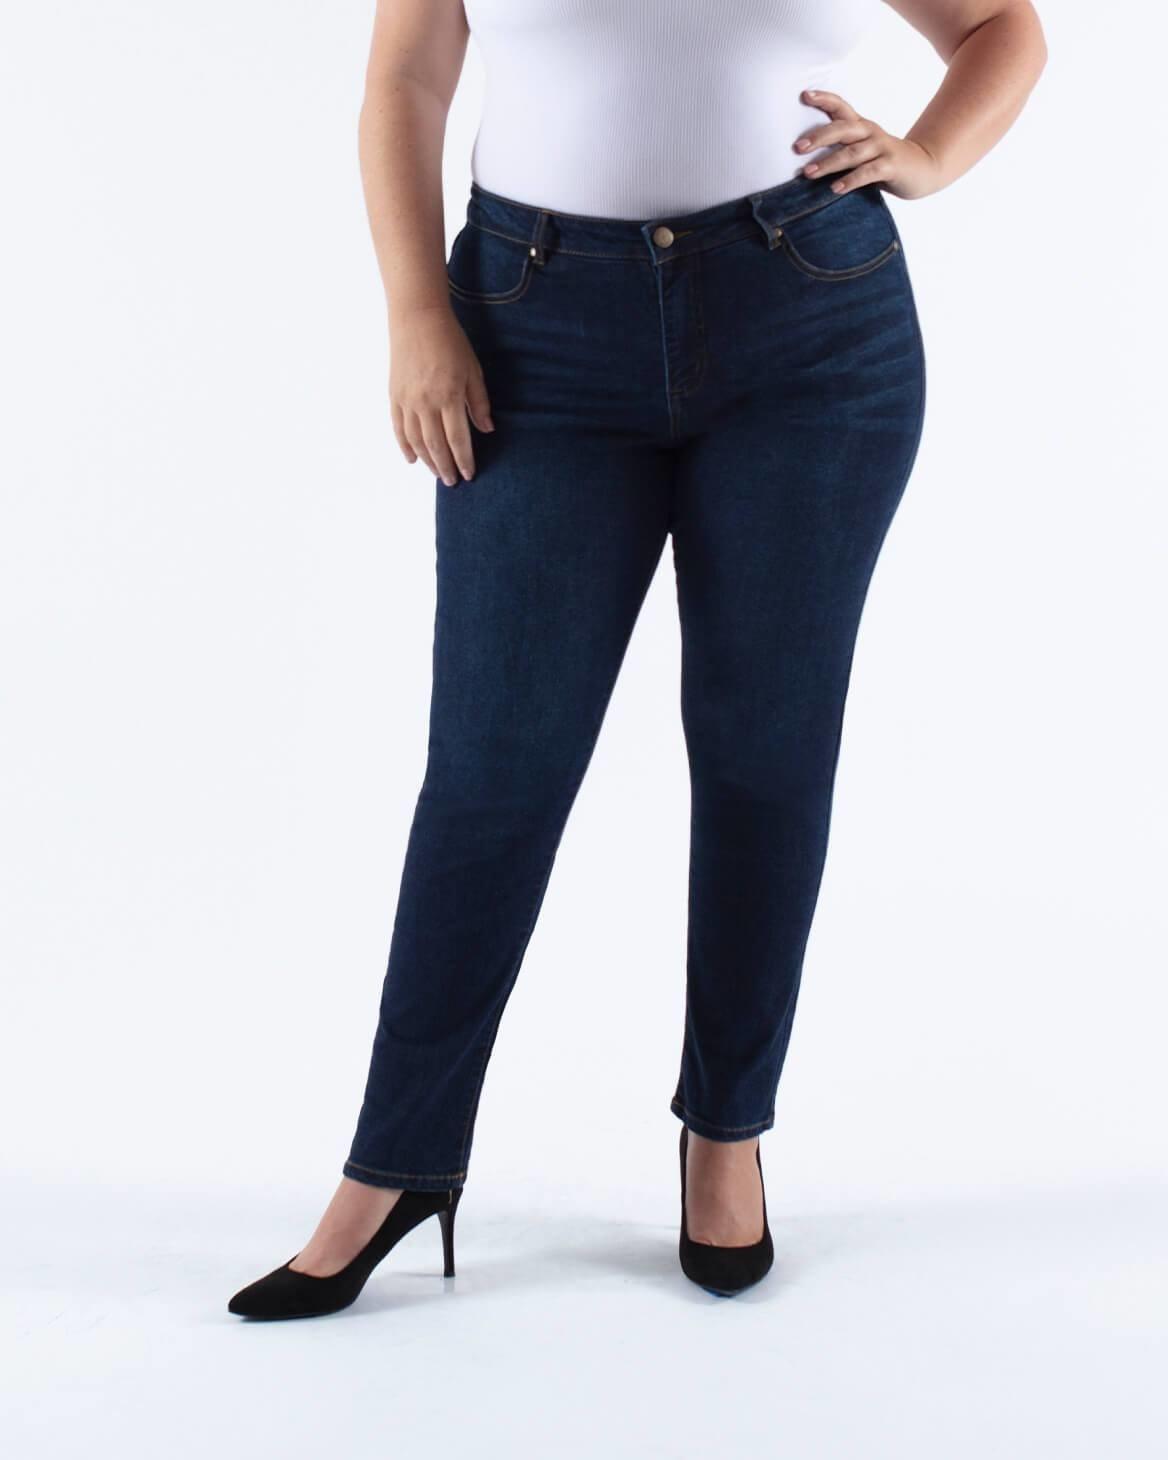 model wearing dark wash skinny jeans